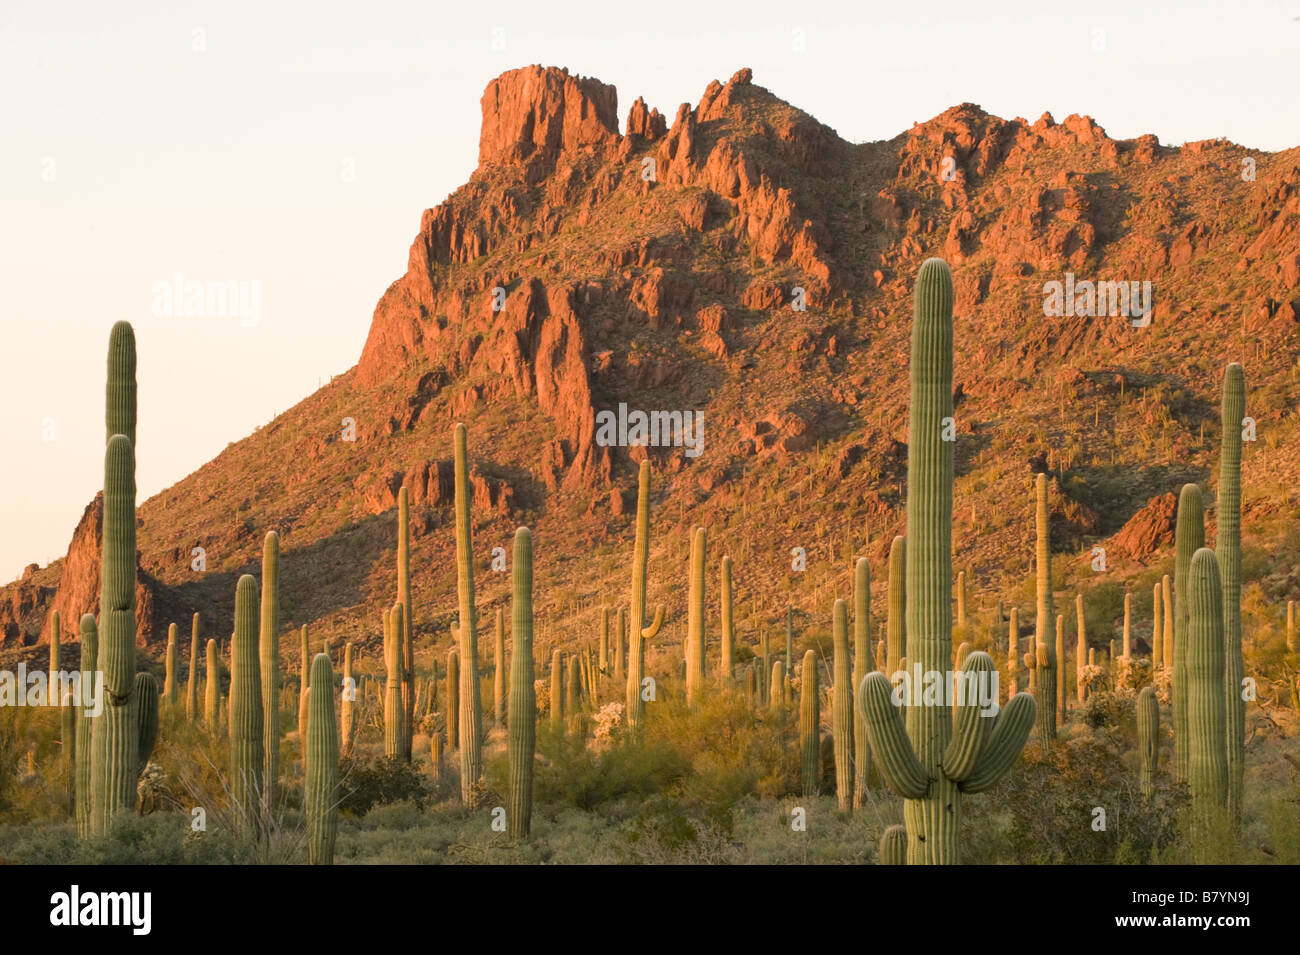 Saguaro Kaktus (Carnegiea Gigantea) Alamo Canyon, Organ Pipe National Monument, Arizona, Sonnenuntergang Stockfoto